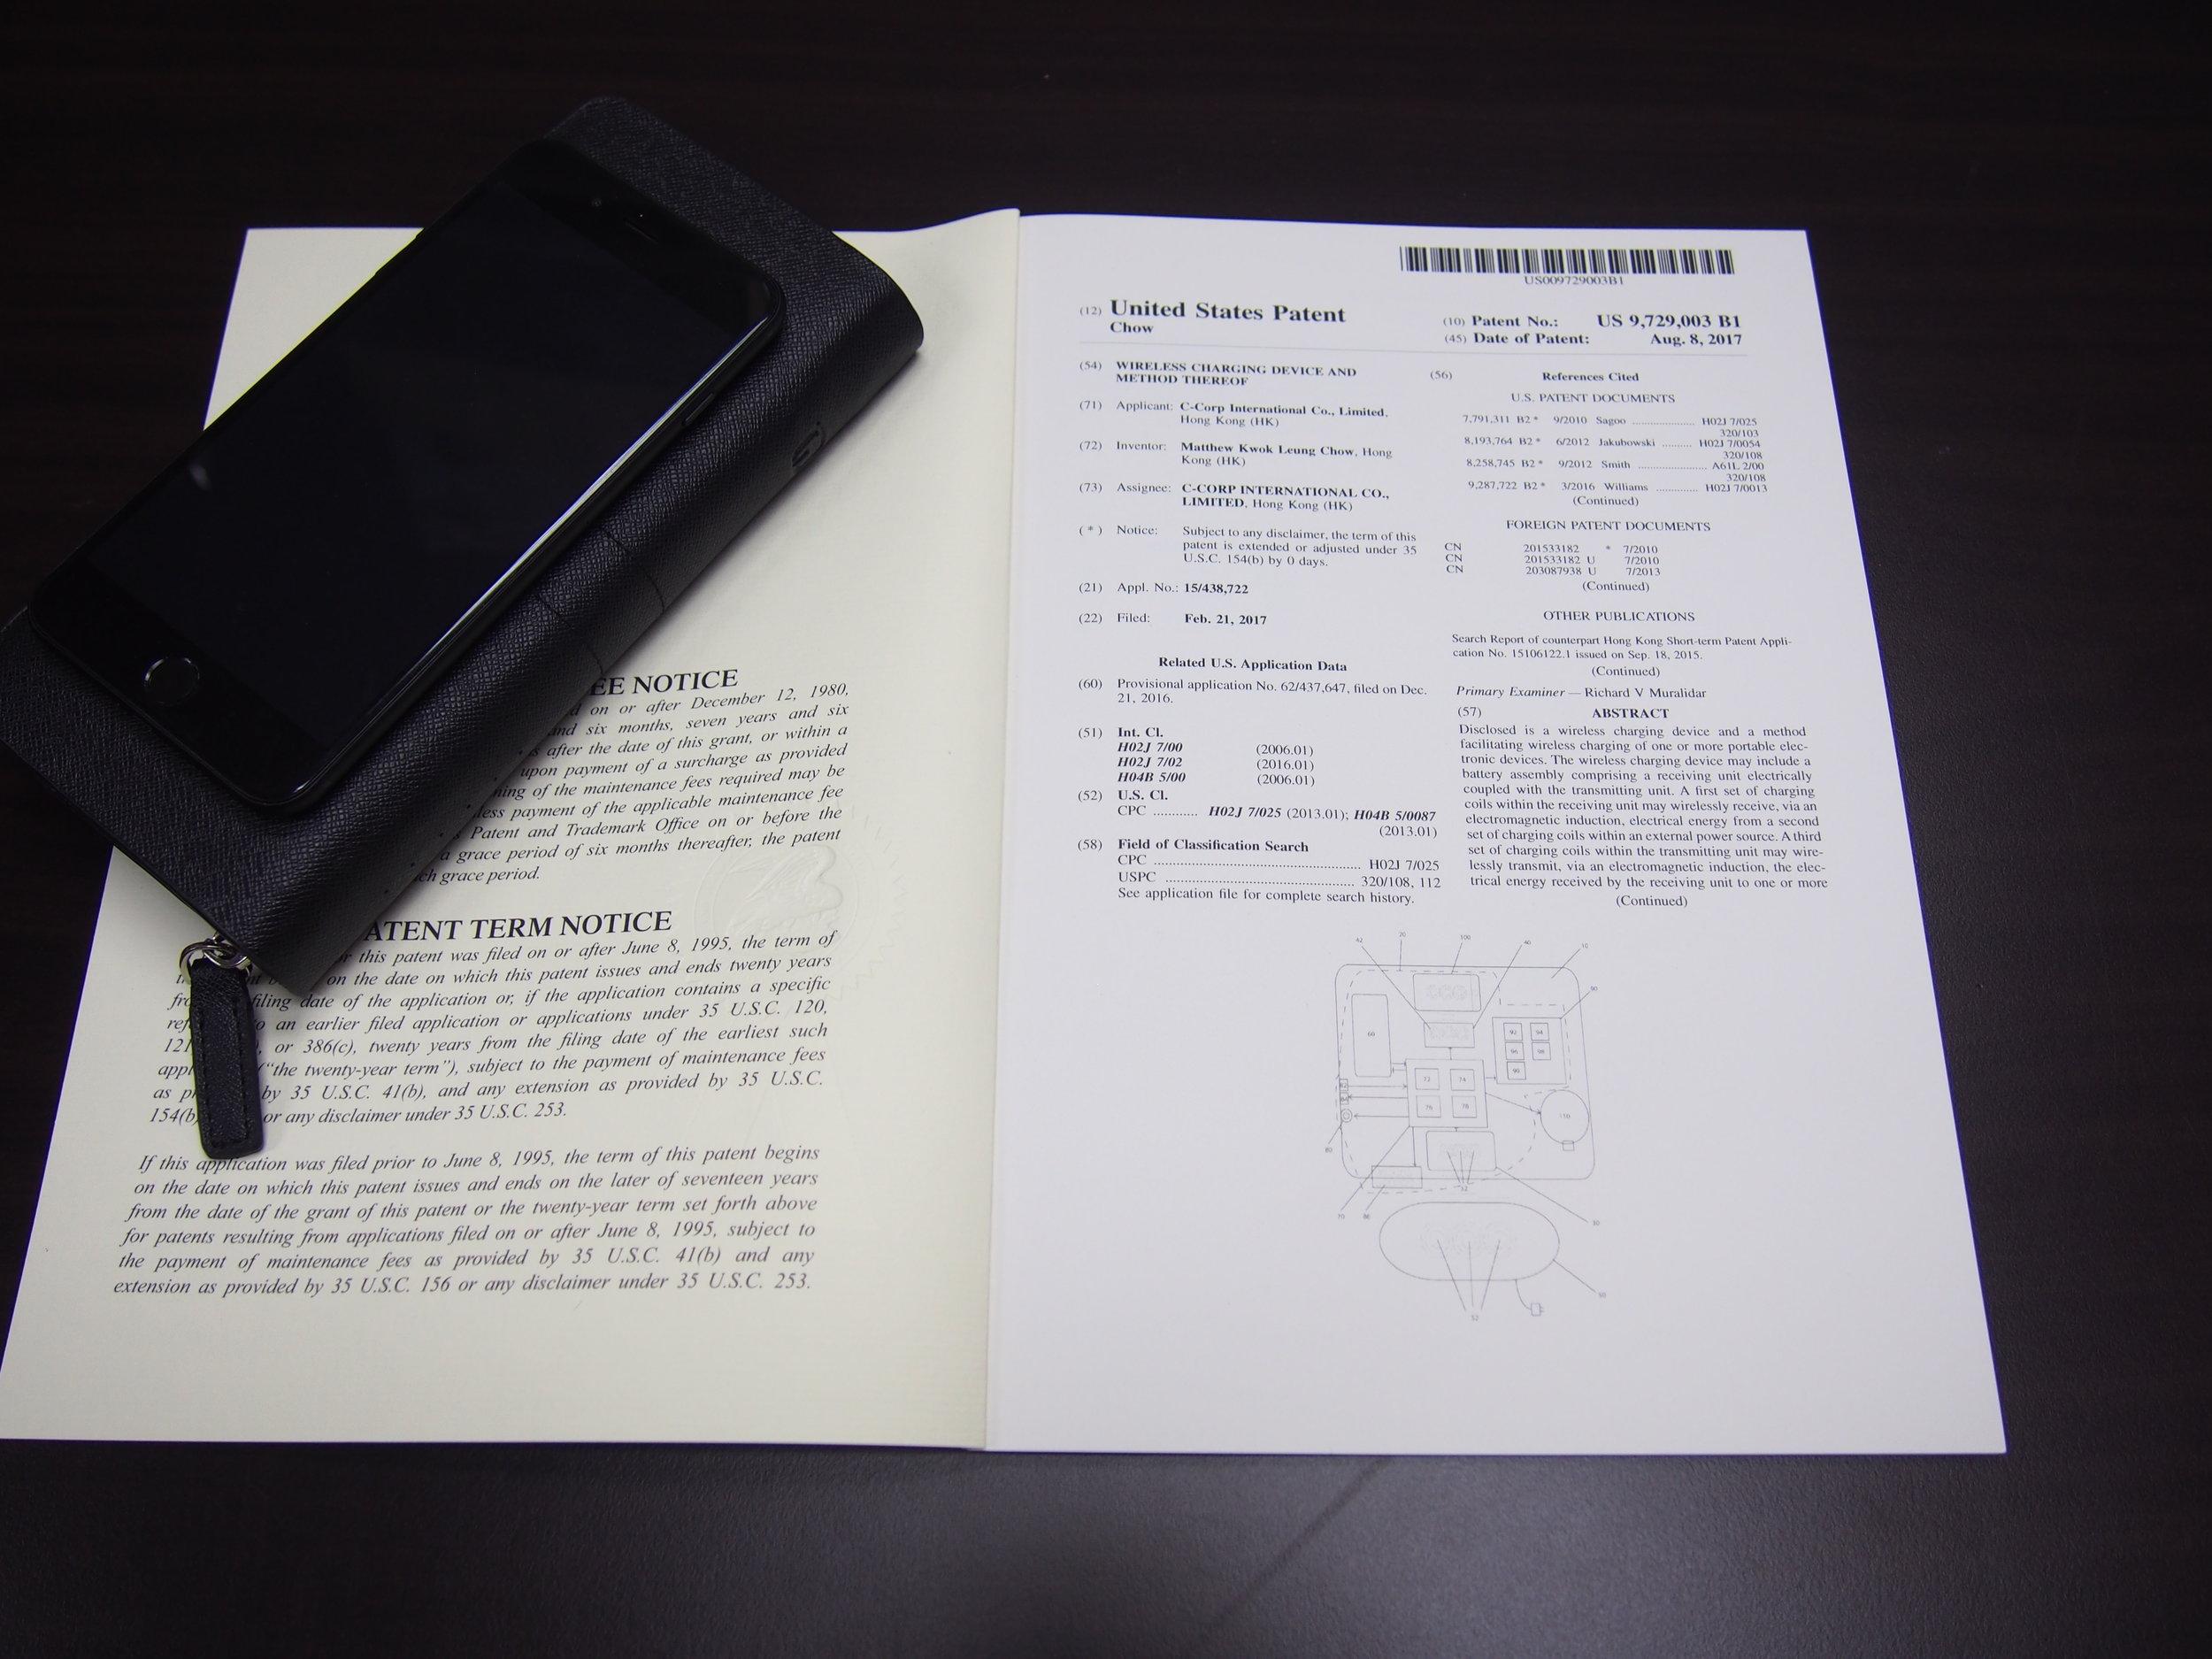 P1010567 copy.JPG